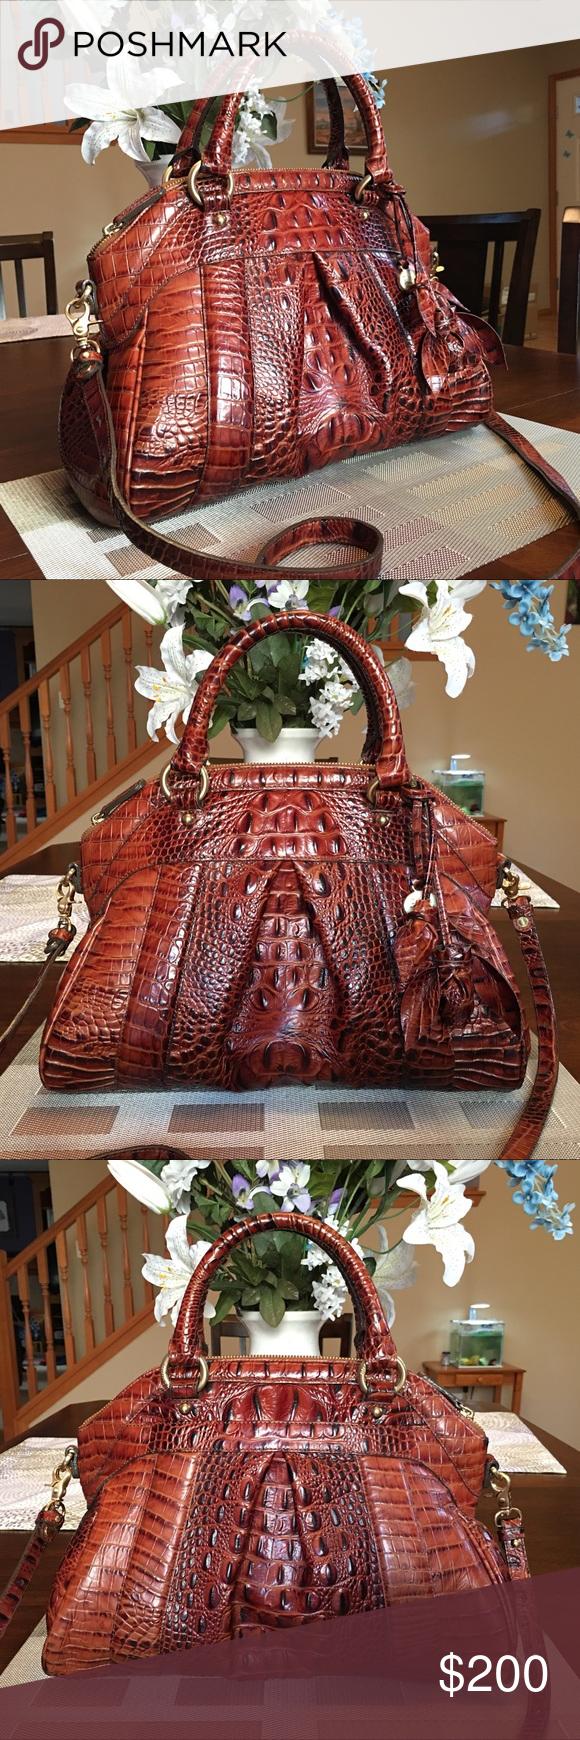 273fafc008d807 🌹Limited Edition🌹Brahmin Pecan Louise Rose Bag